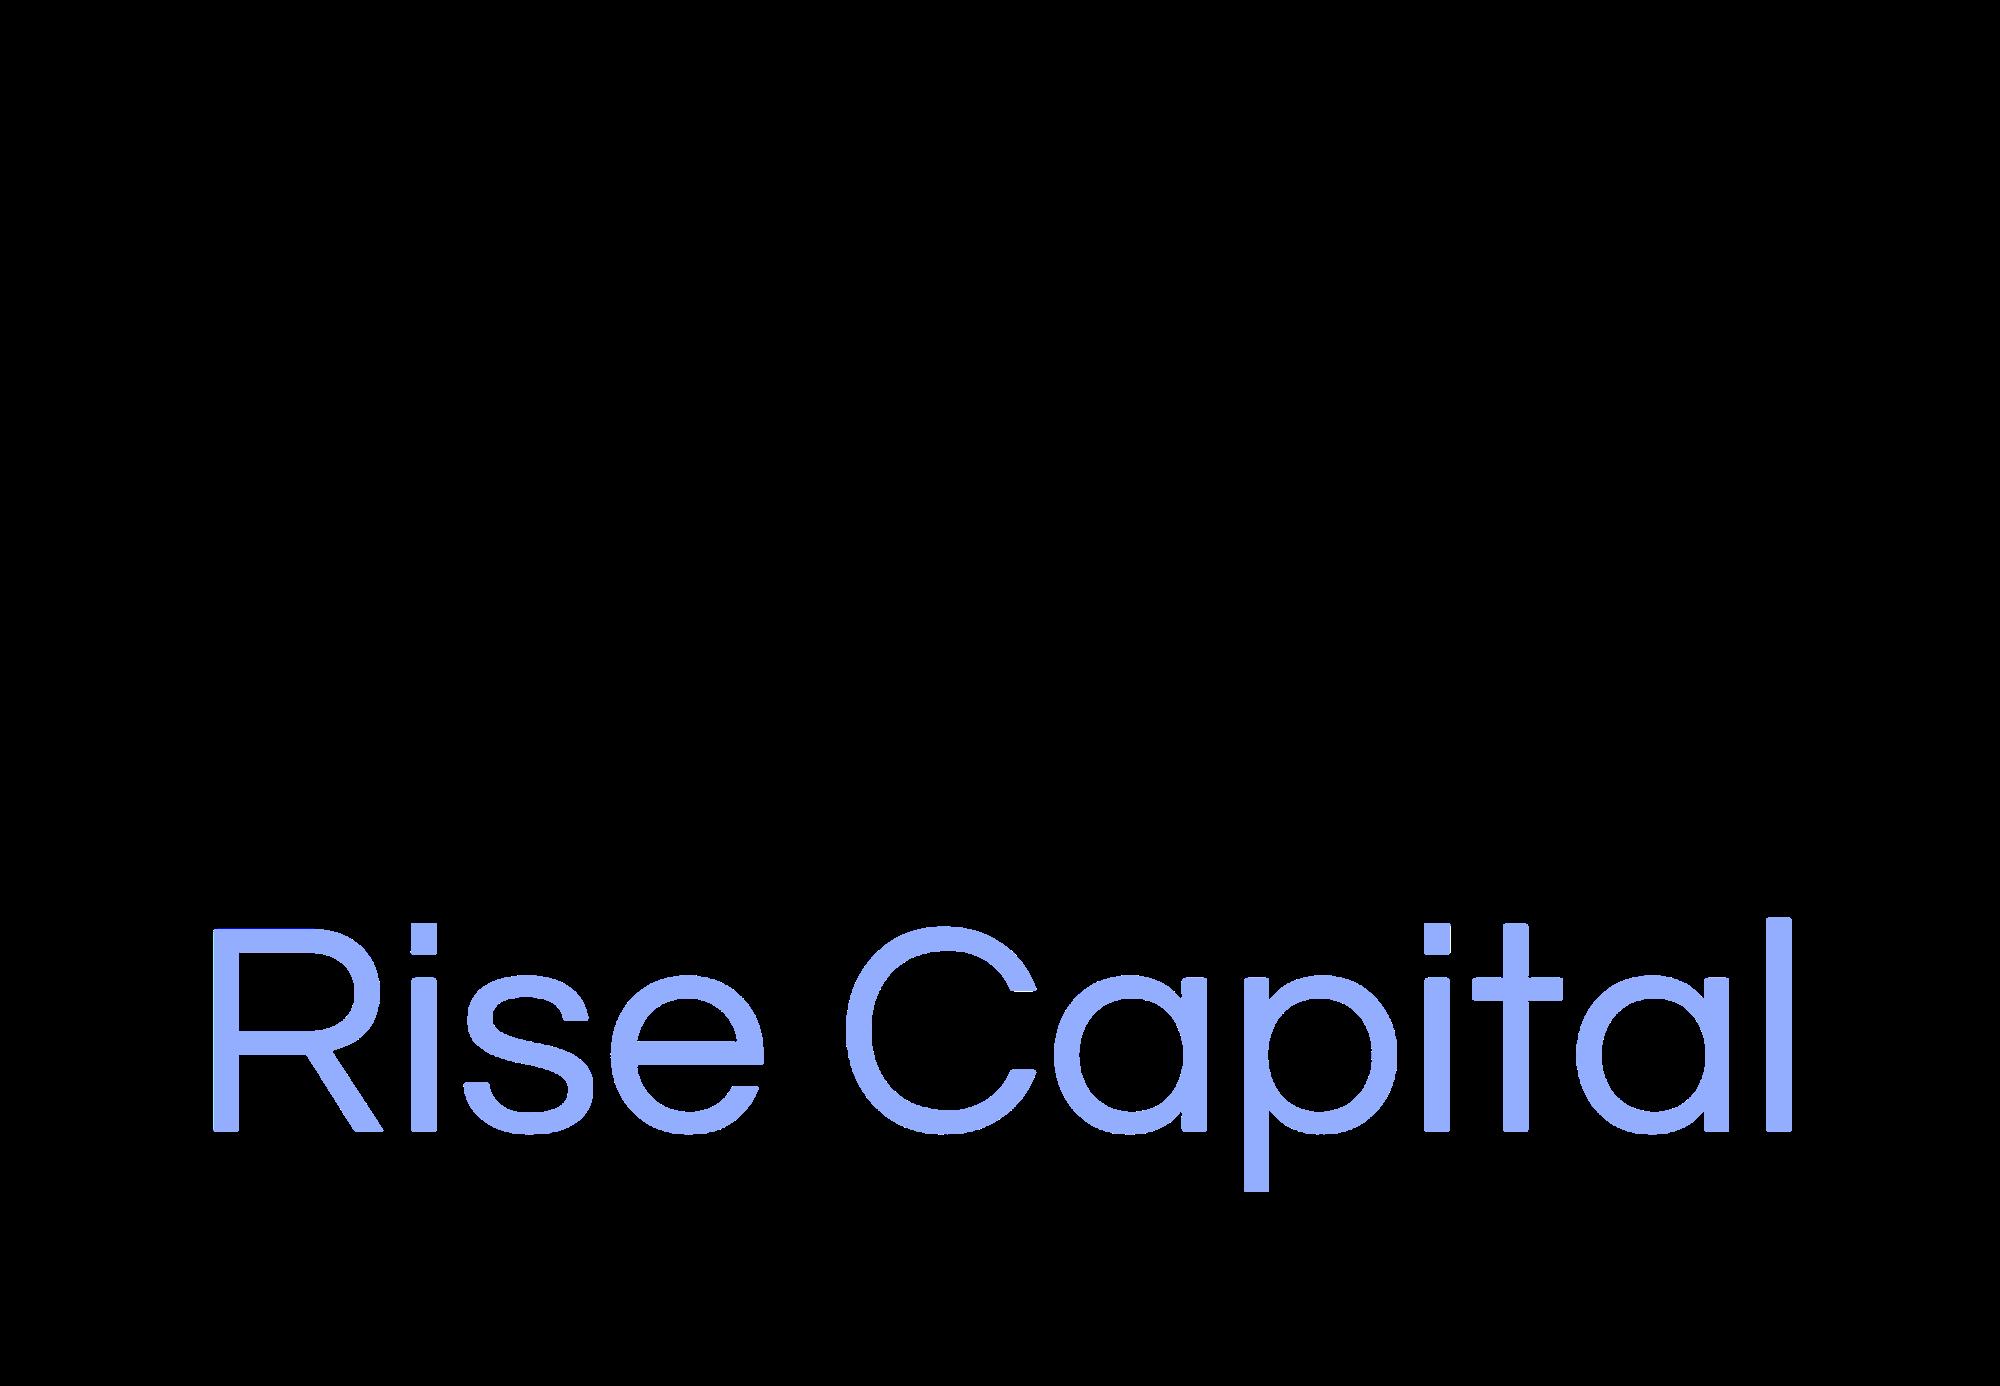 Rise Capital-logo.png